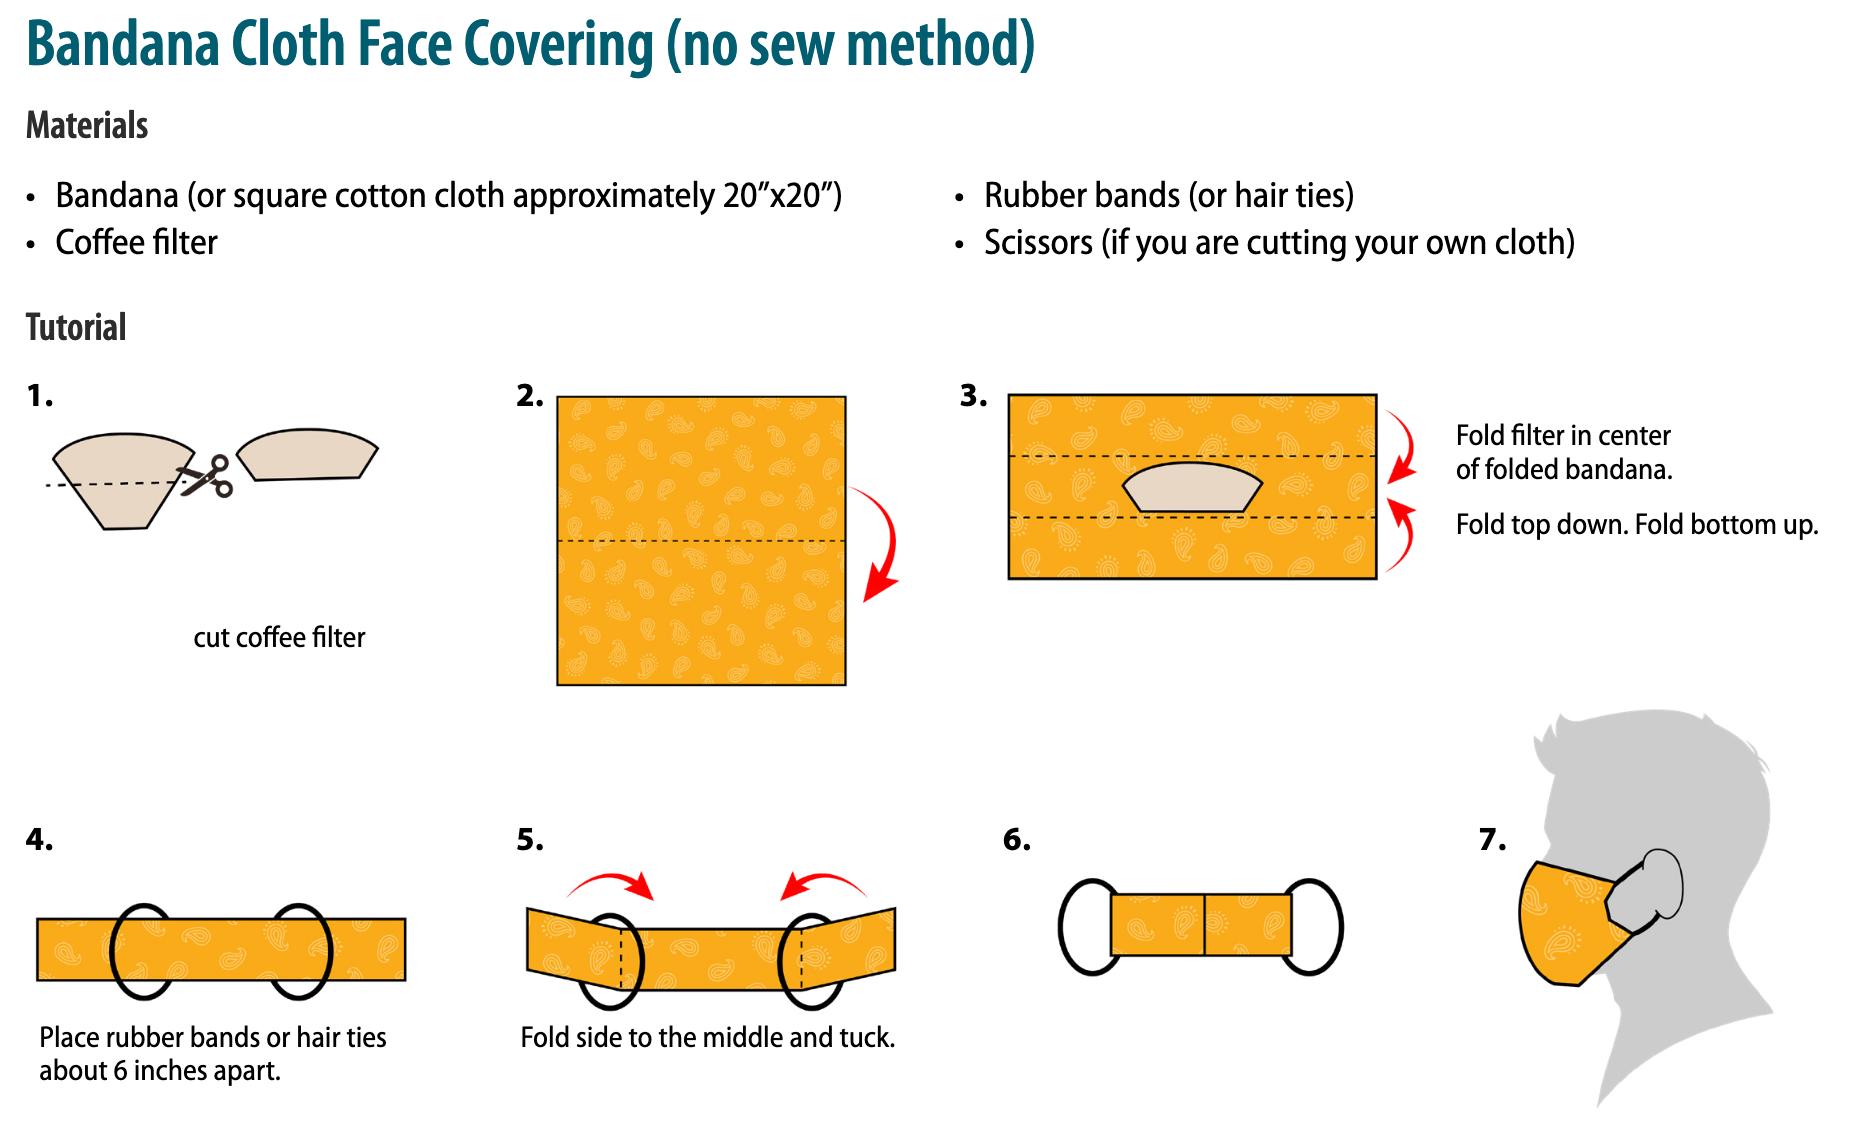 Bandana Cloth Face Covering (no sew method)